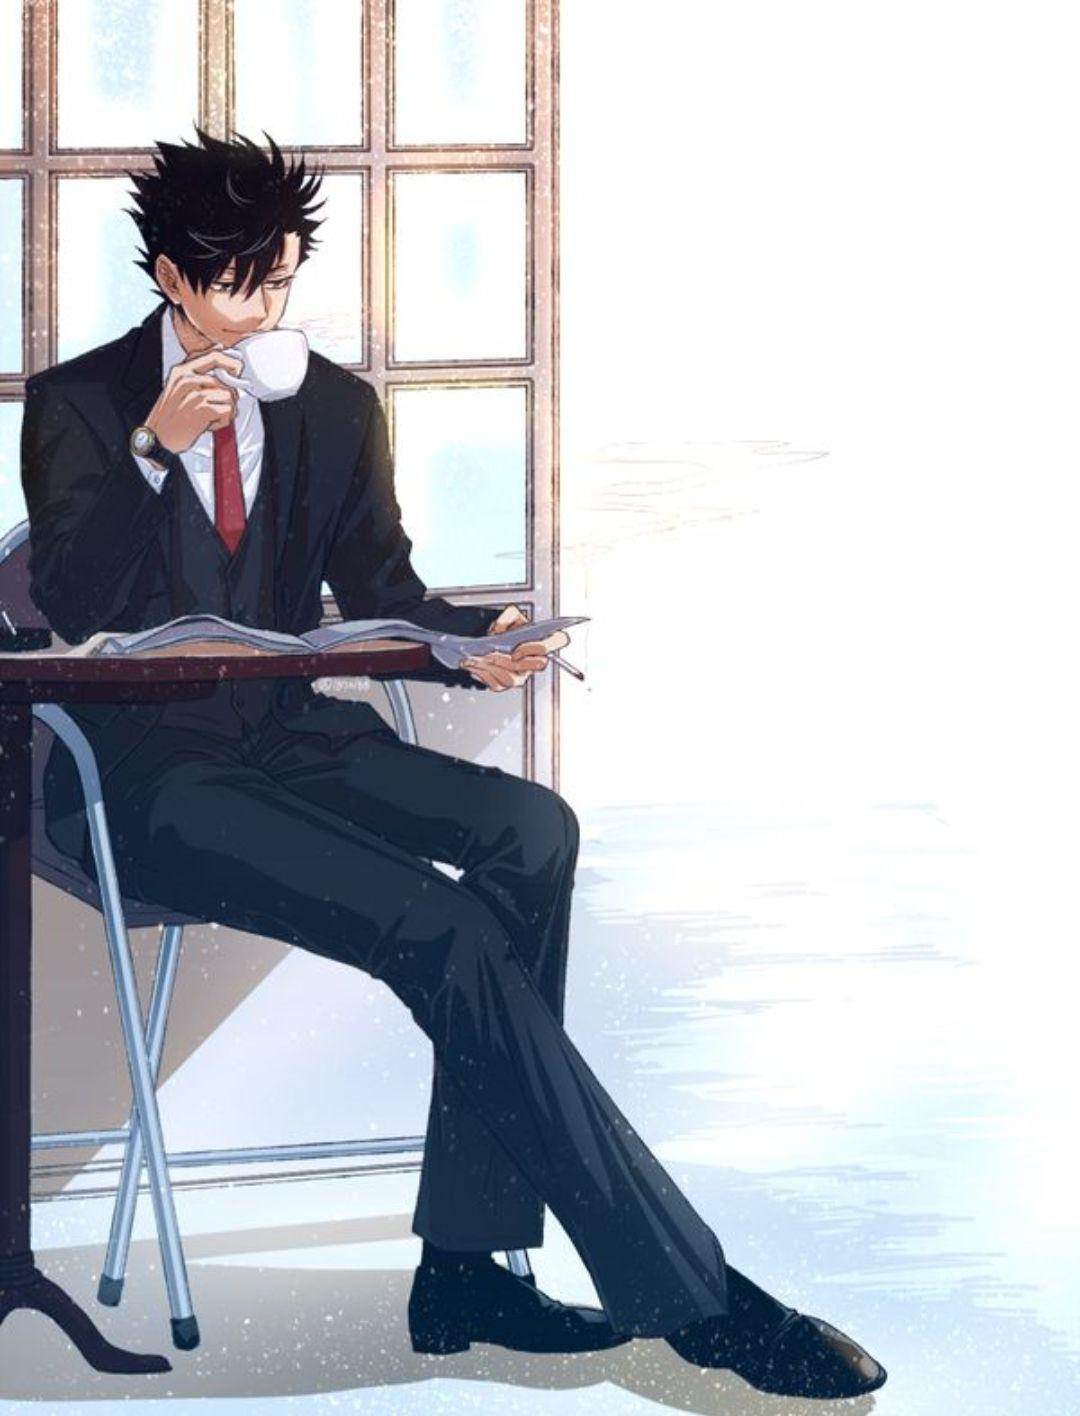 Haikyuu One-Shots And Lemons - -Sugar Daddy--[Kuroo Tetsurou